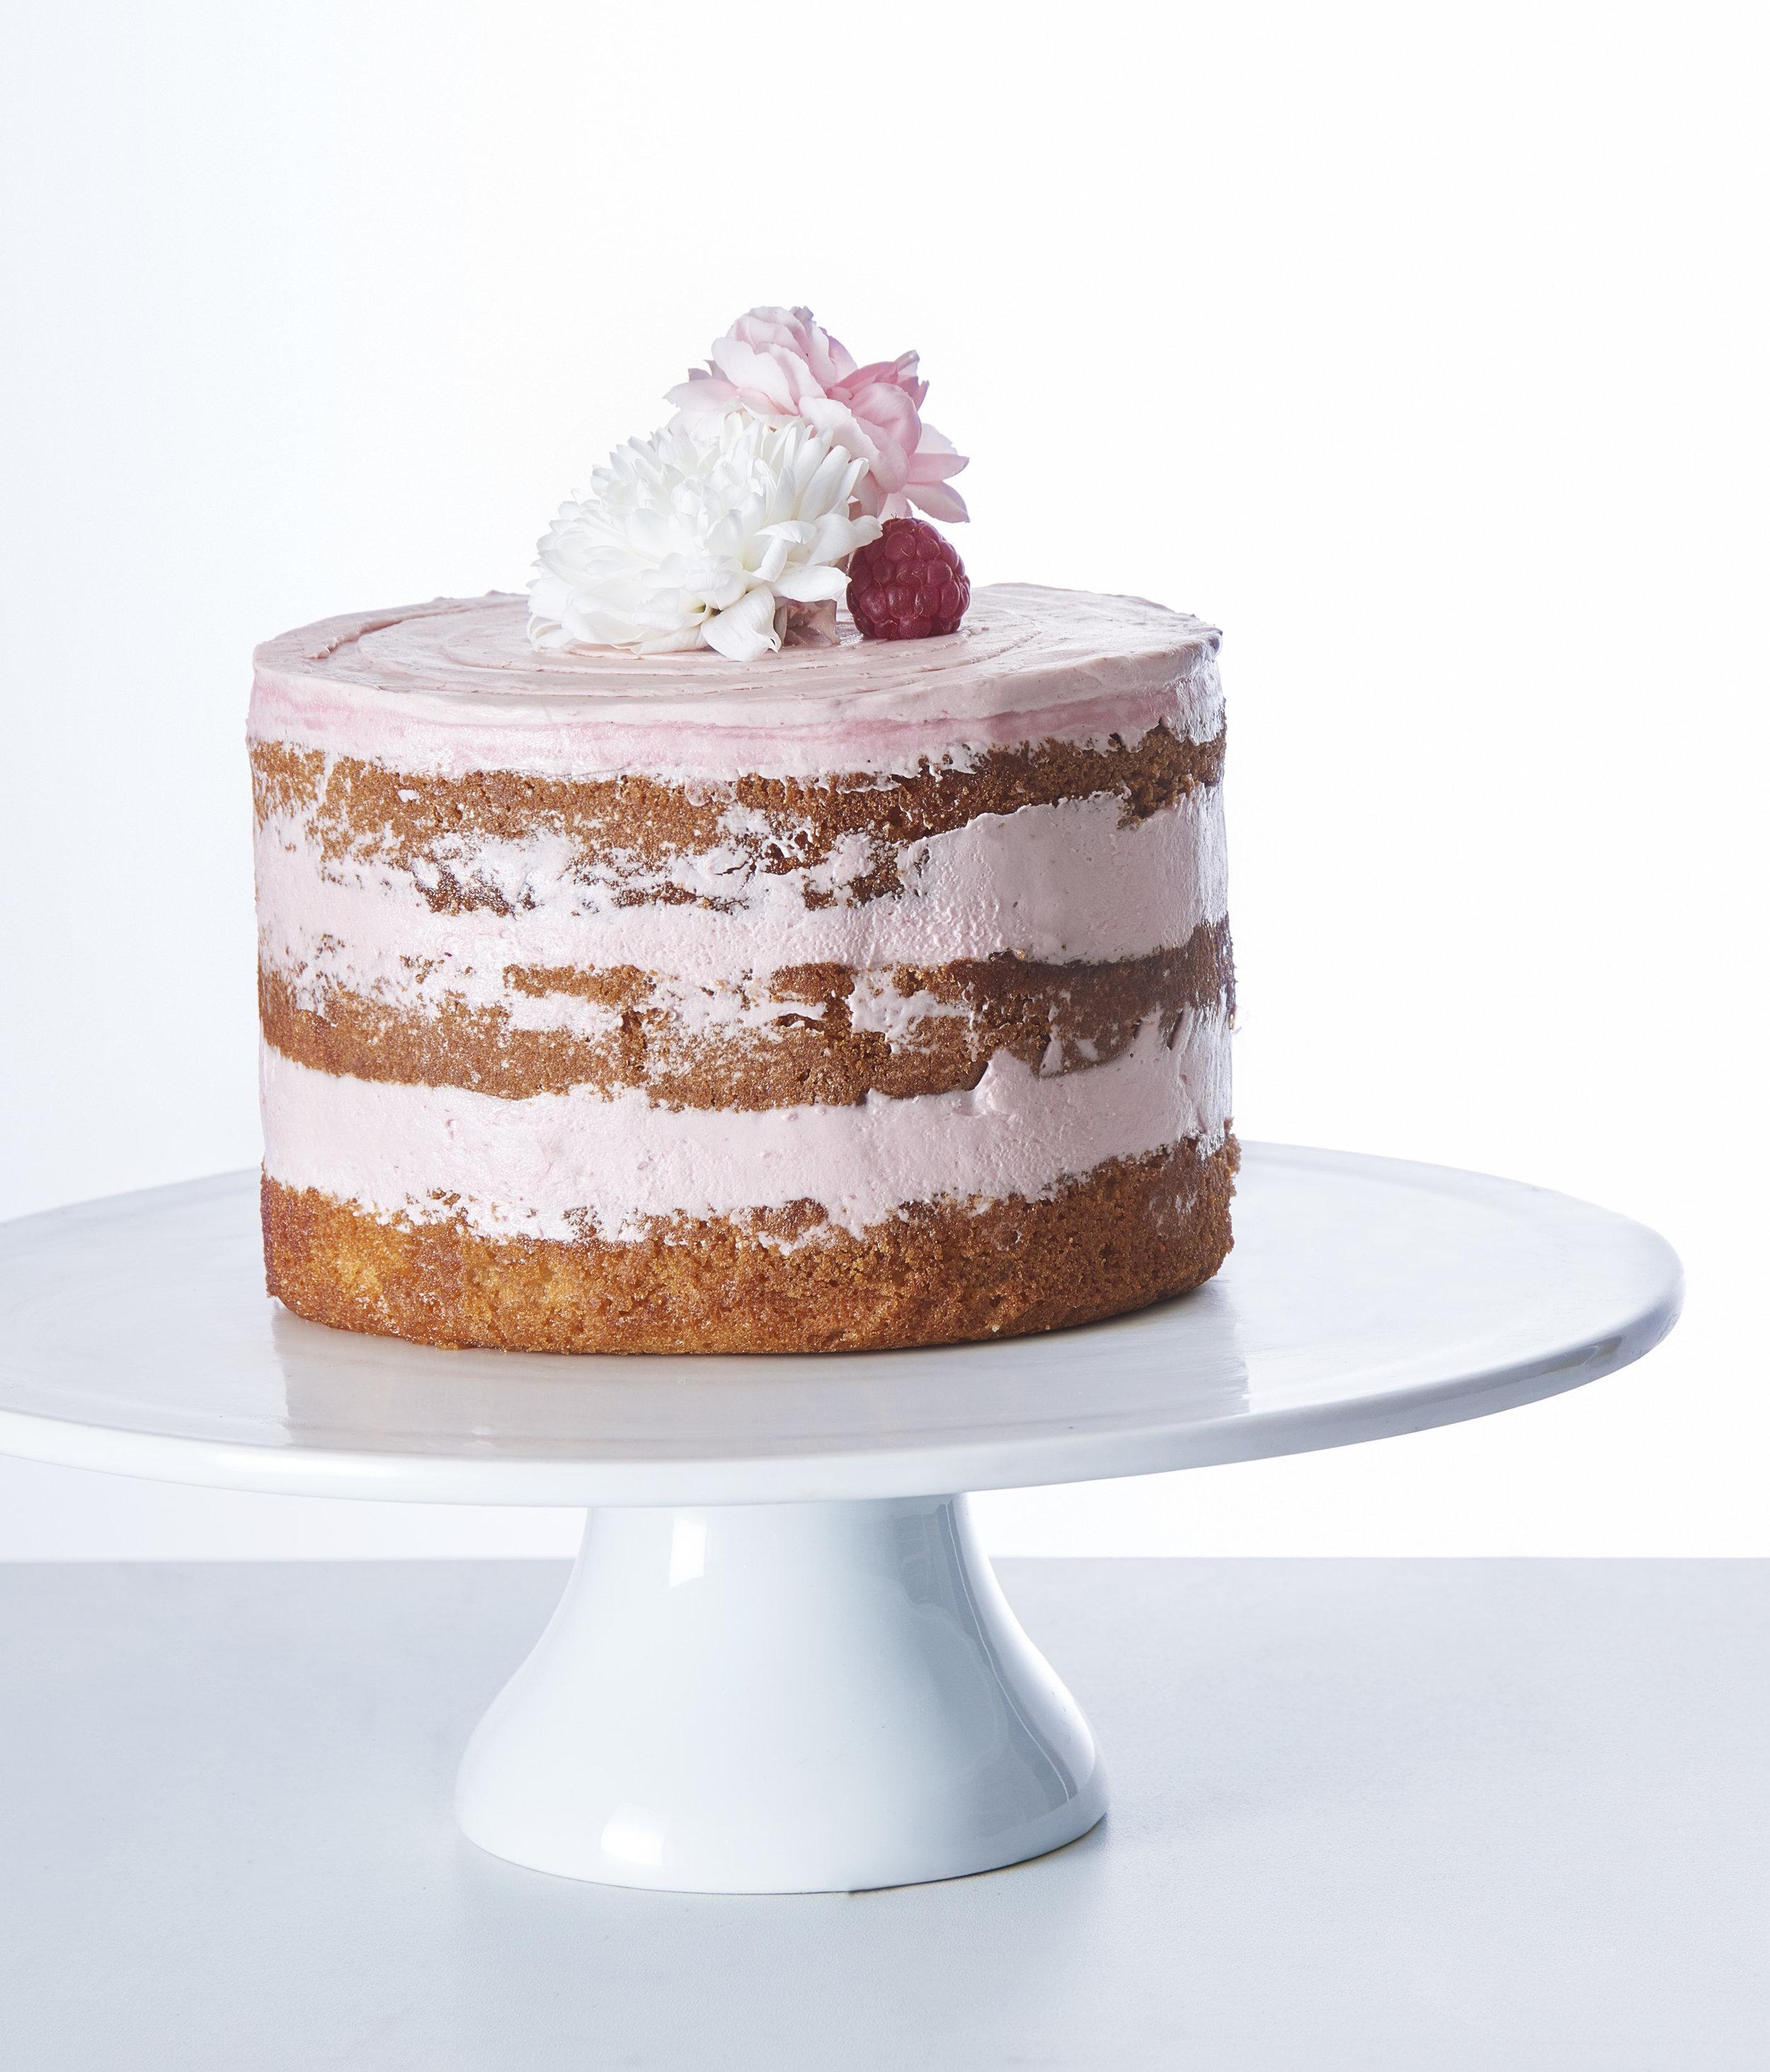 1703_LOVE_AND_CAKE_14-2.jpg